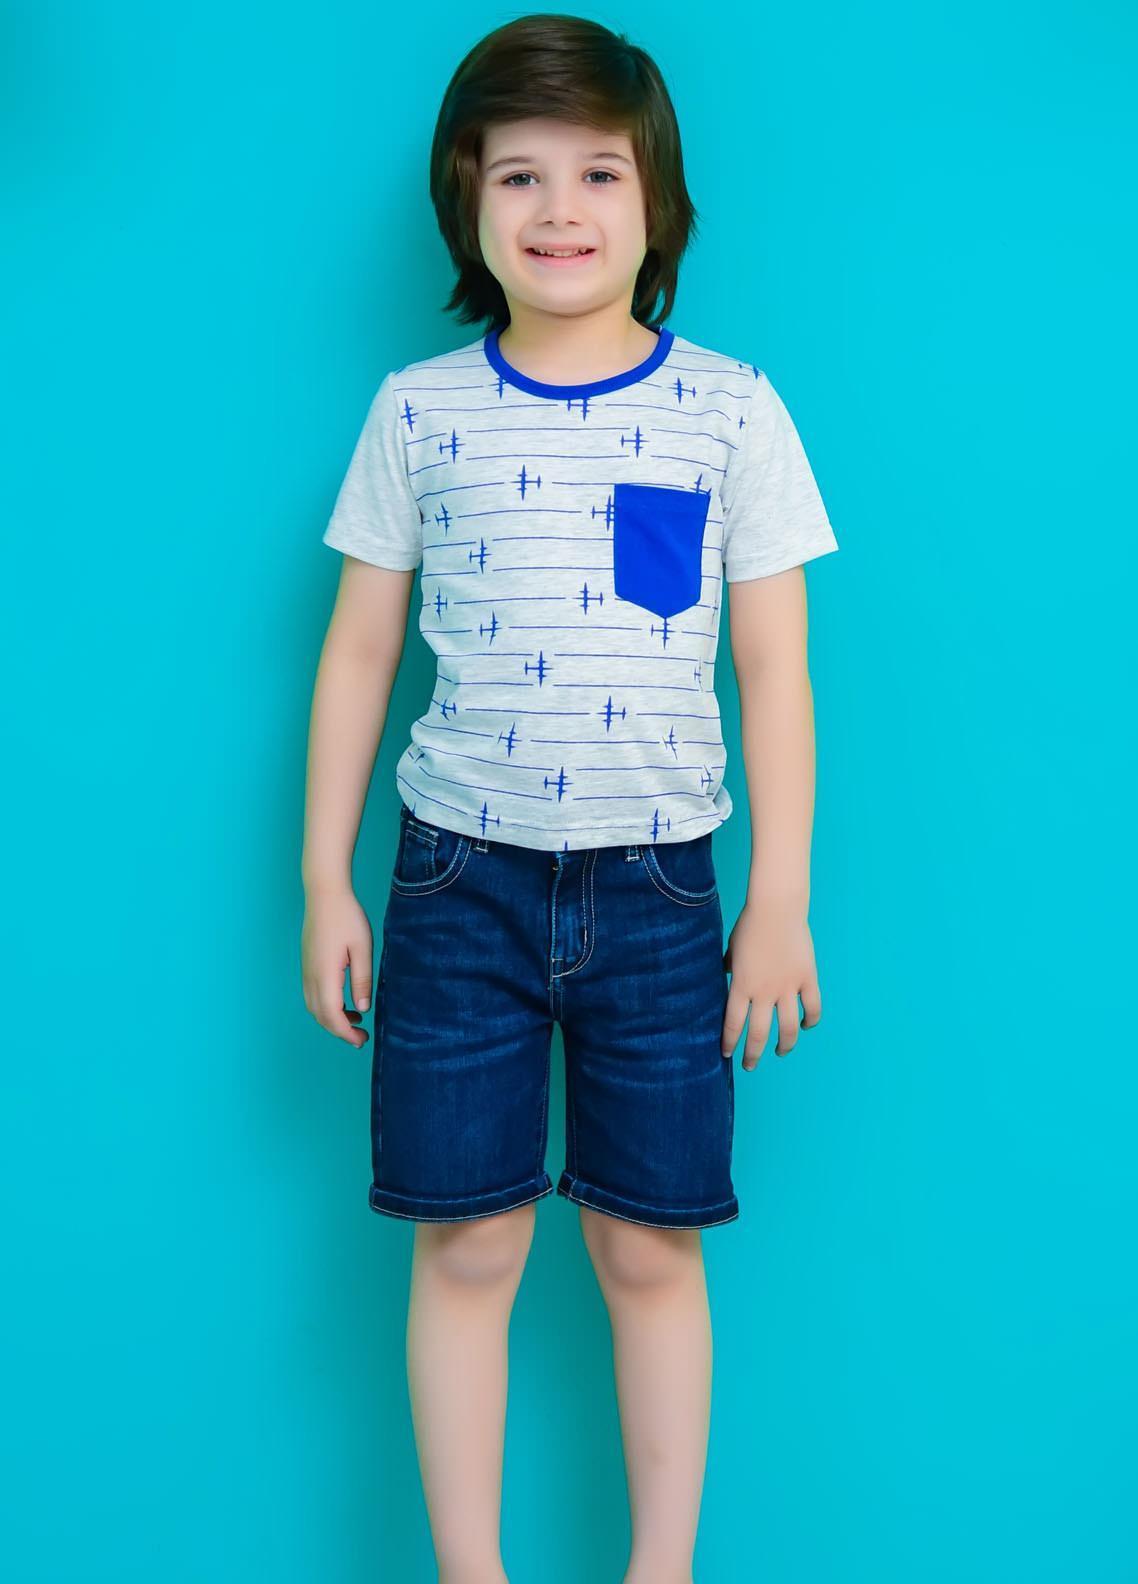 Ochre Cotton Casual T-Shirts for Boys -  OKB-80 White